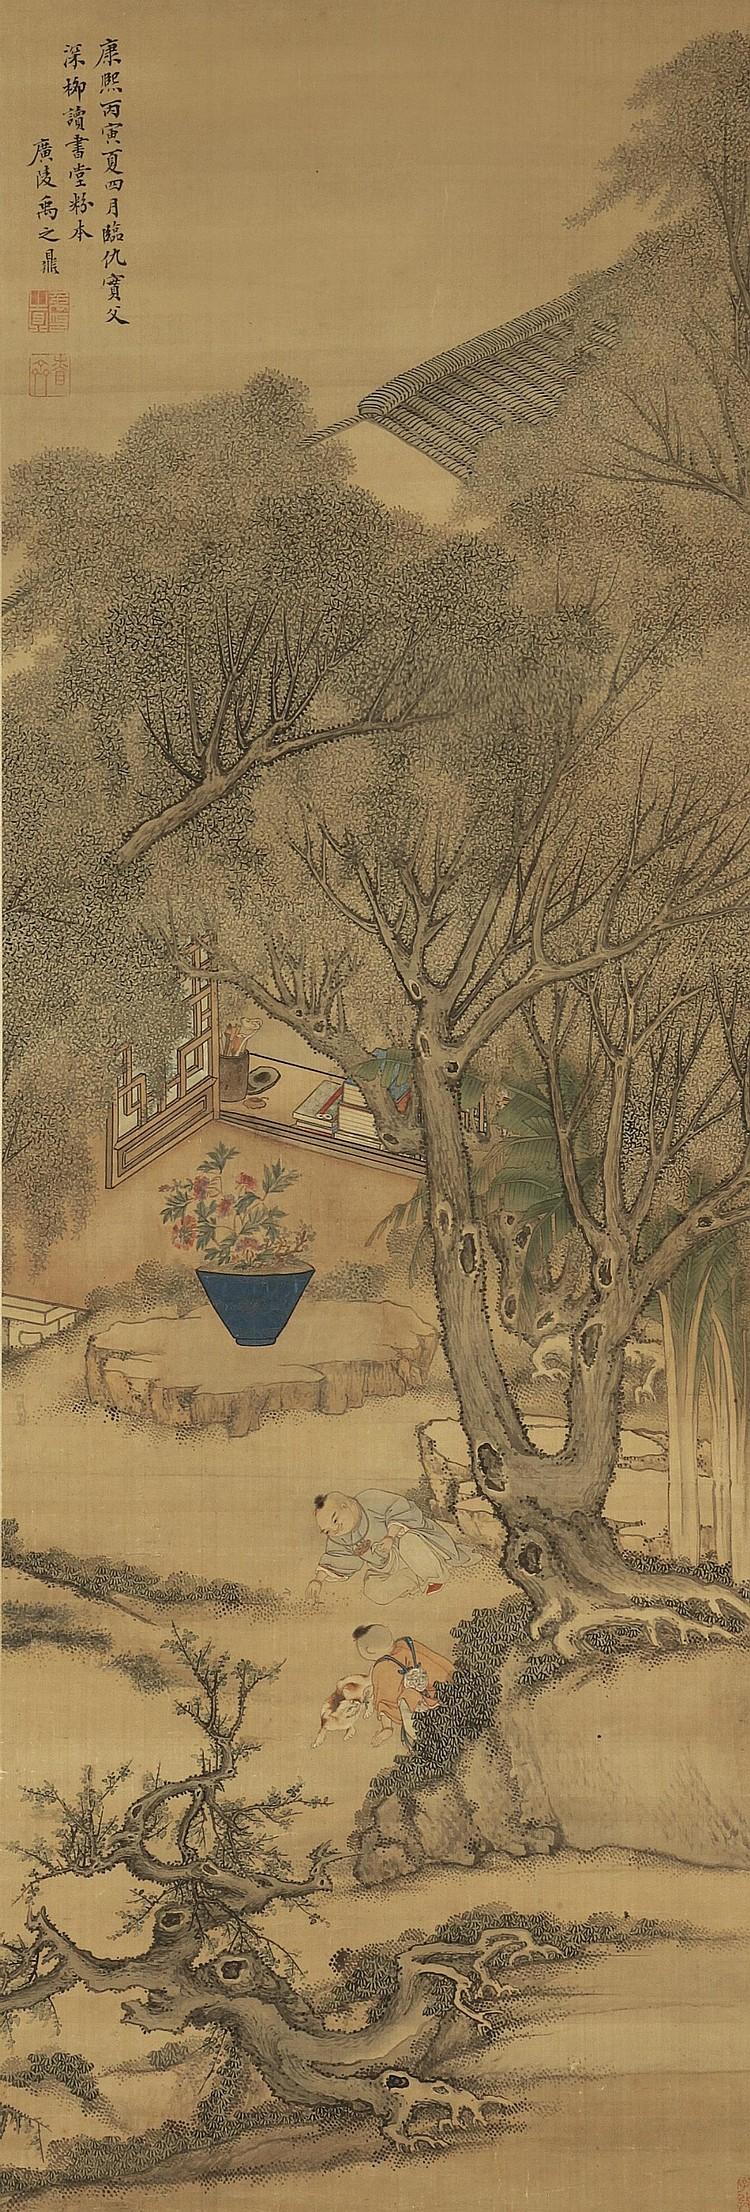 YU ZHIDING CA. 1647-1709